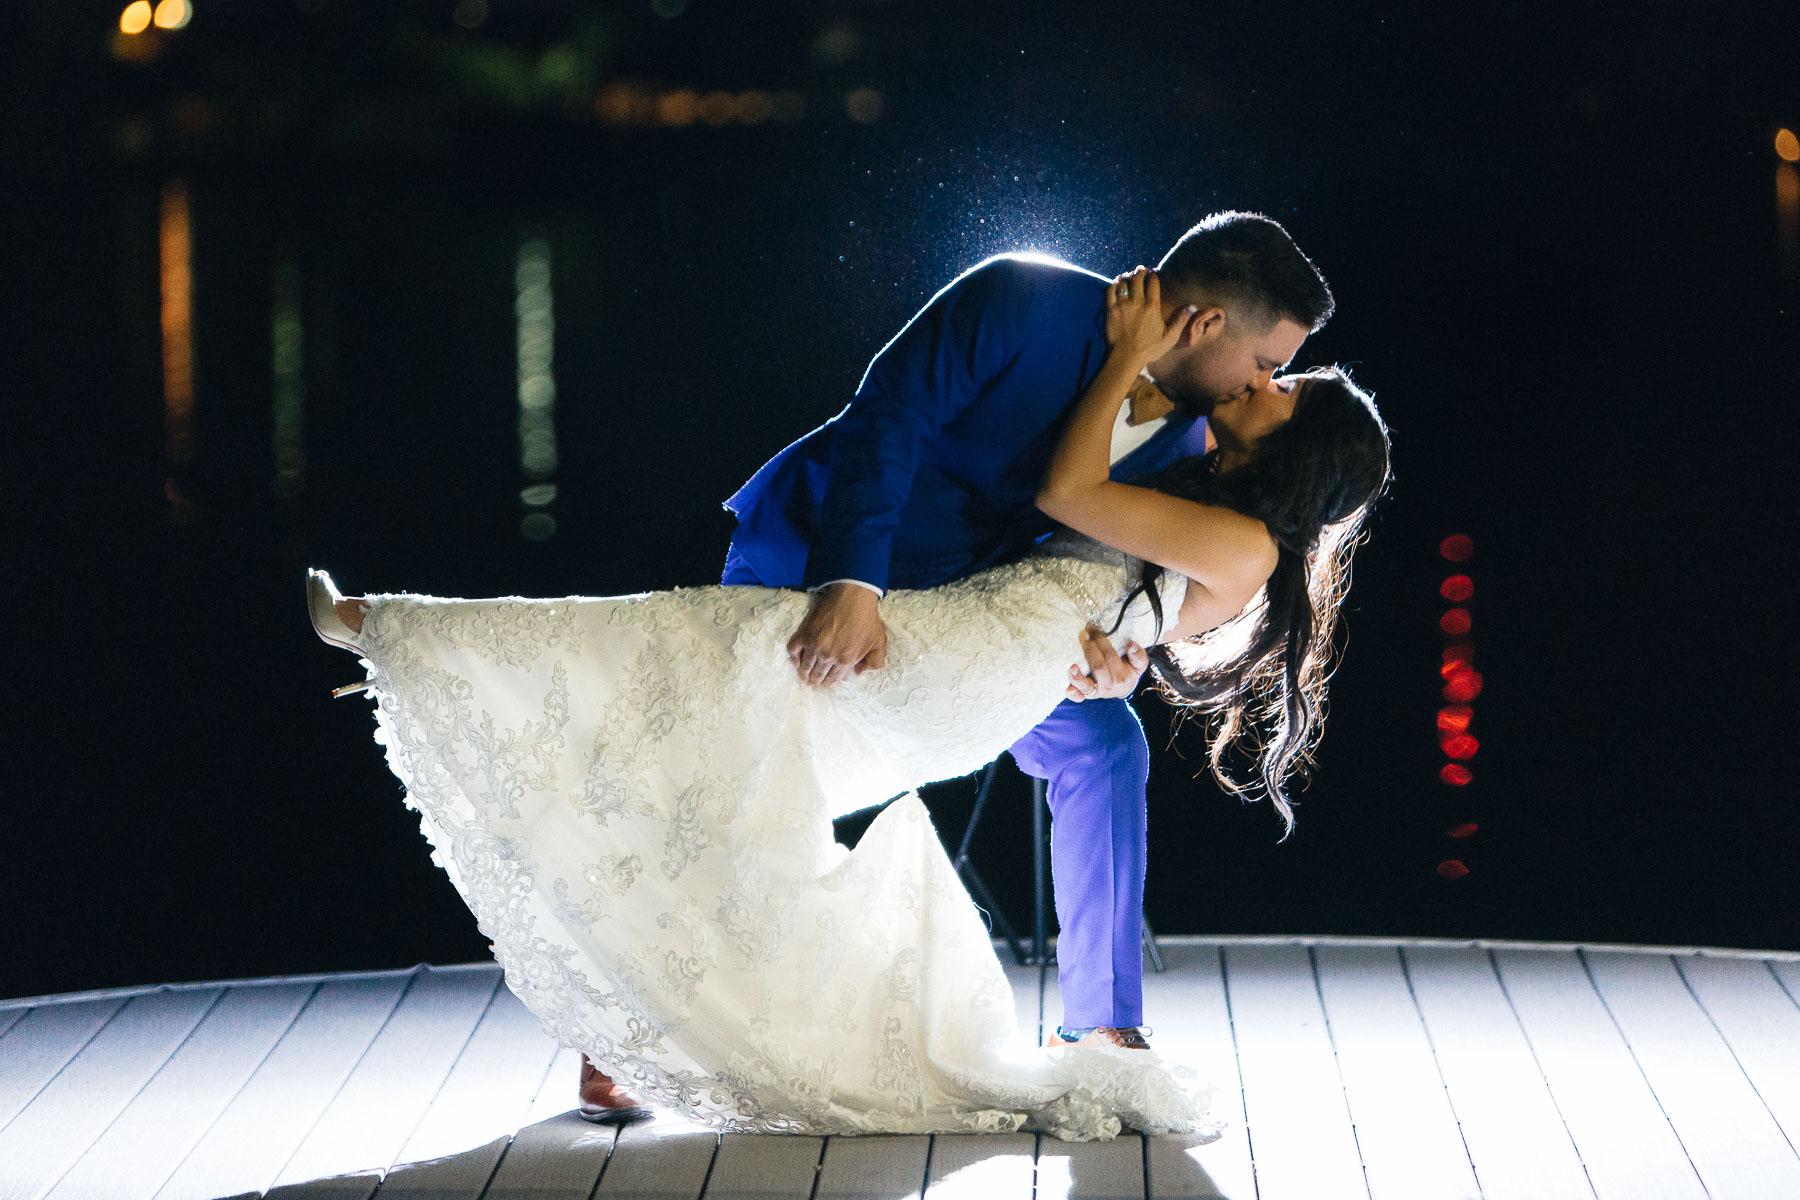 161029-Luxium-Weddings-Arizona-Jeff-Griselda-First-Look-Val-Vista-Lakes-Gilber-088.jpg